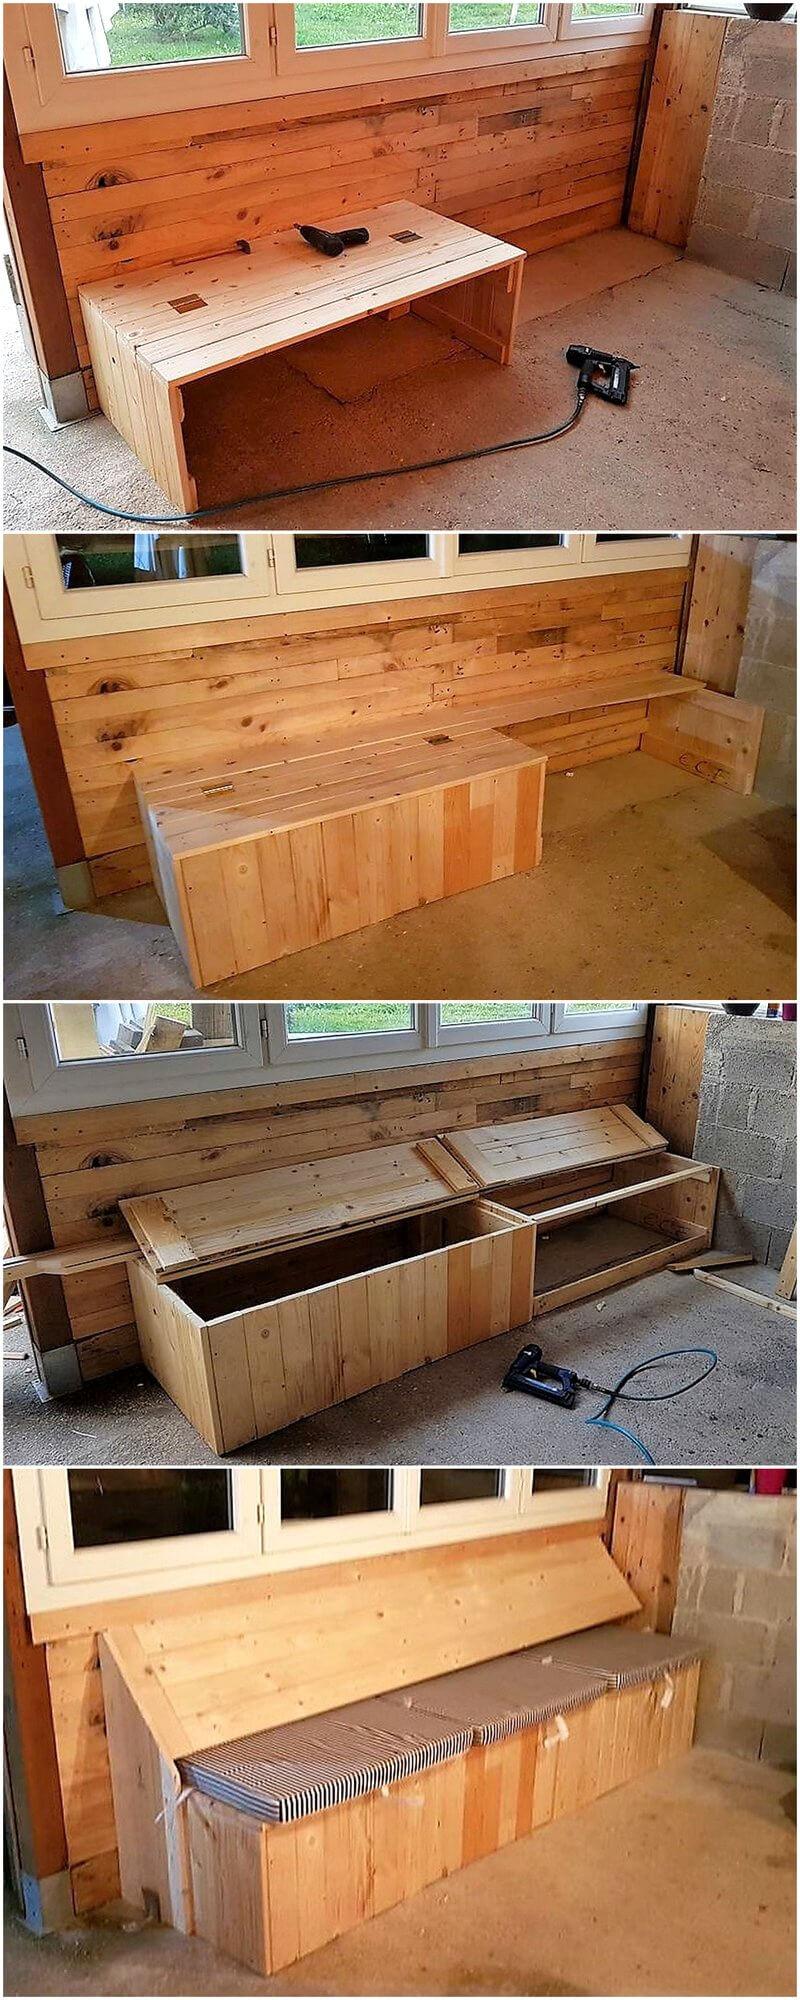 Diy Wooden Pallet Sofa Seat With Storage